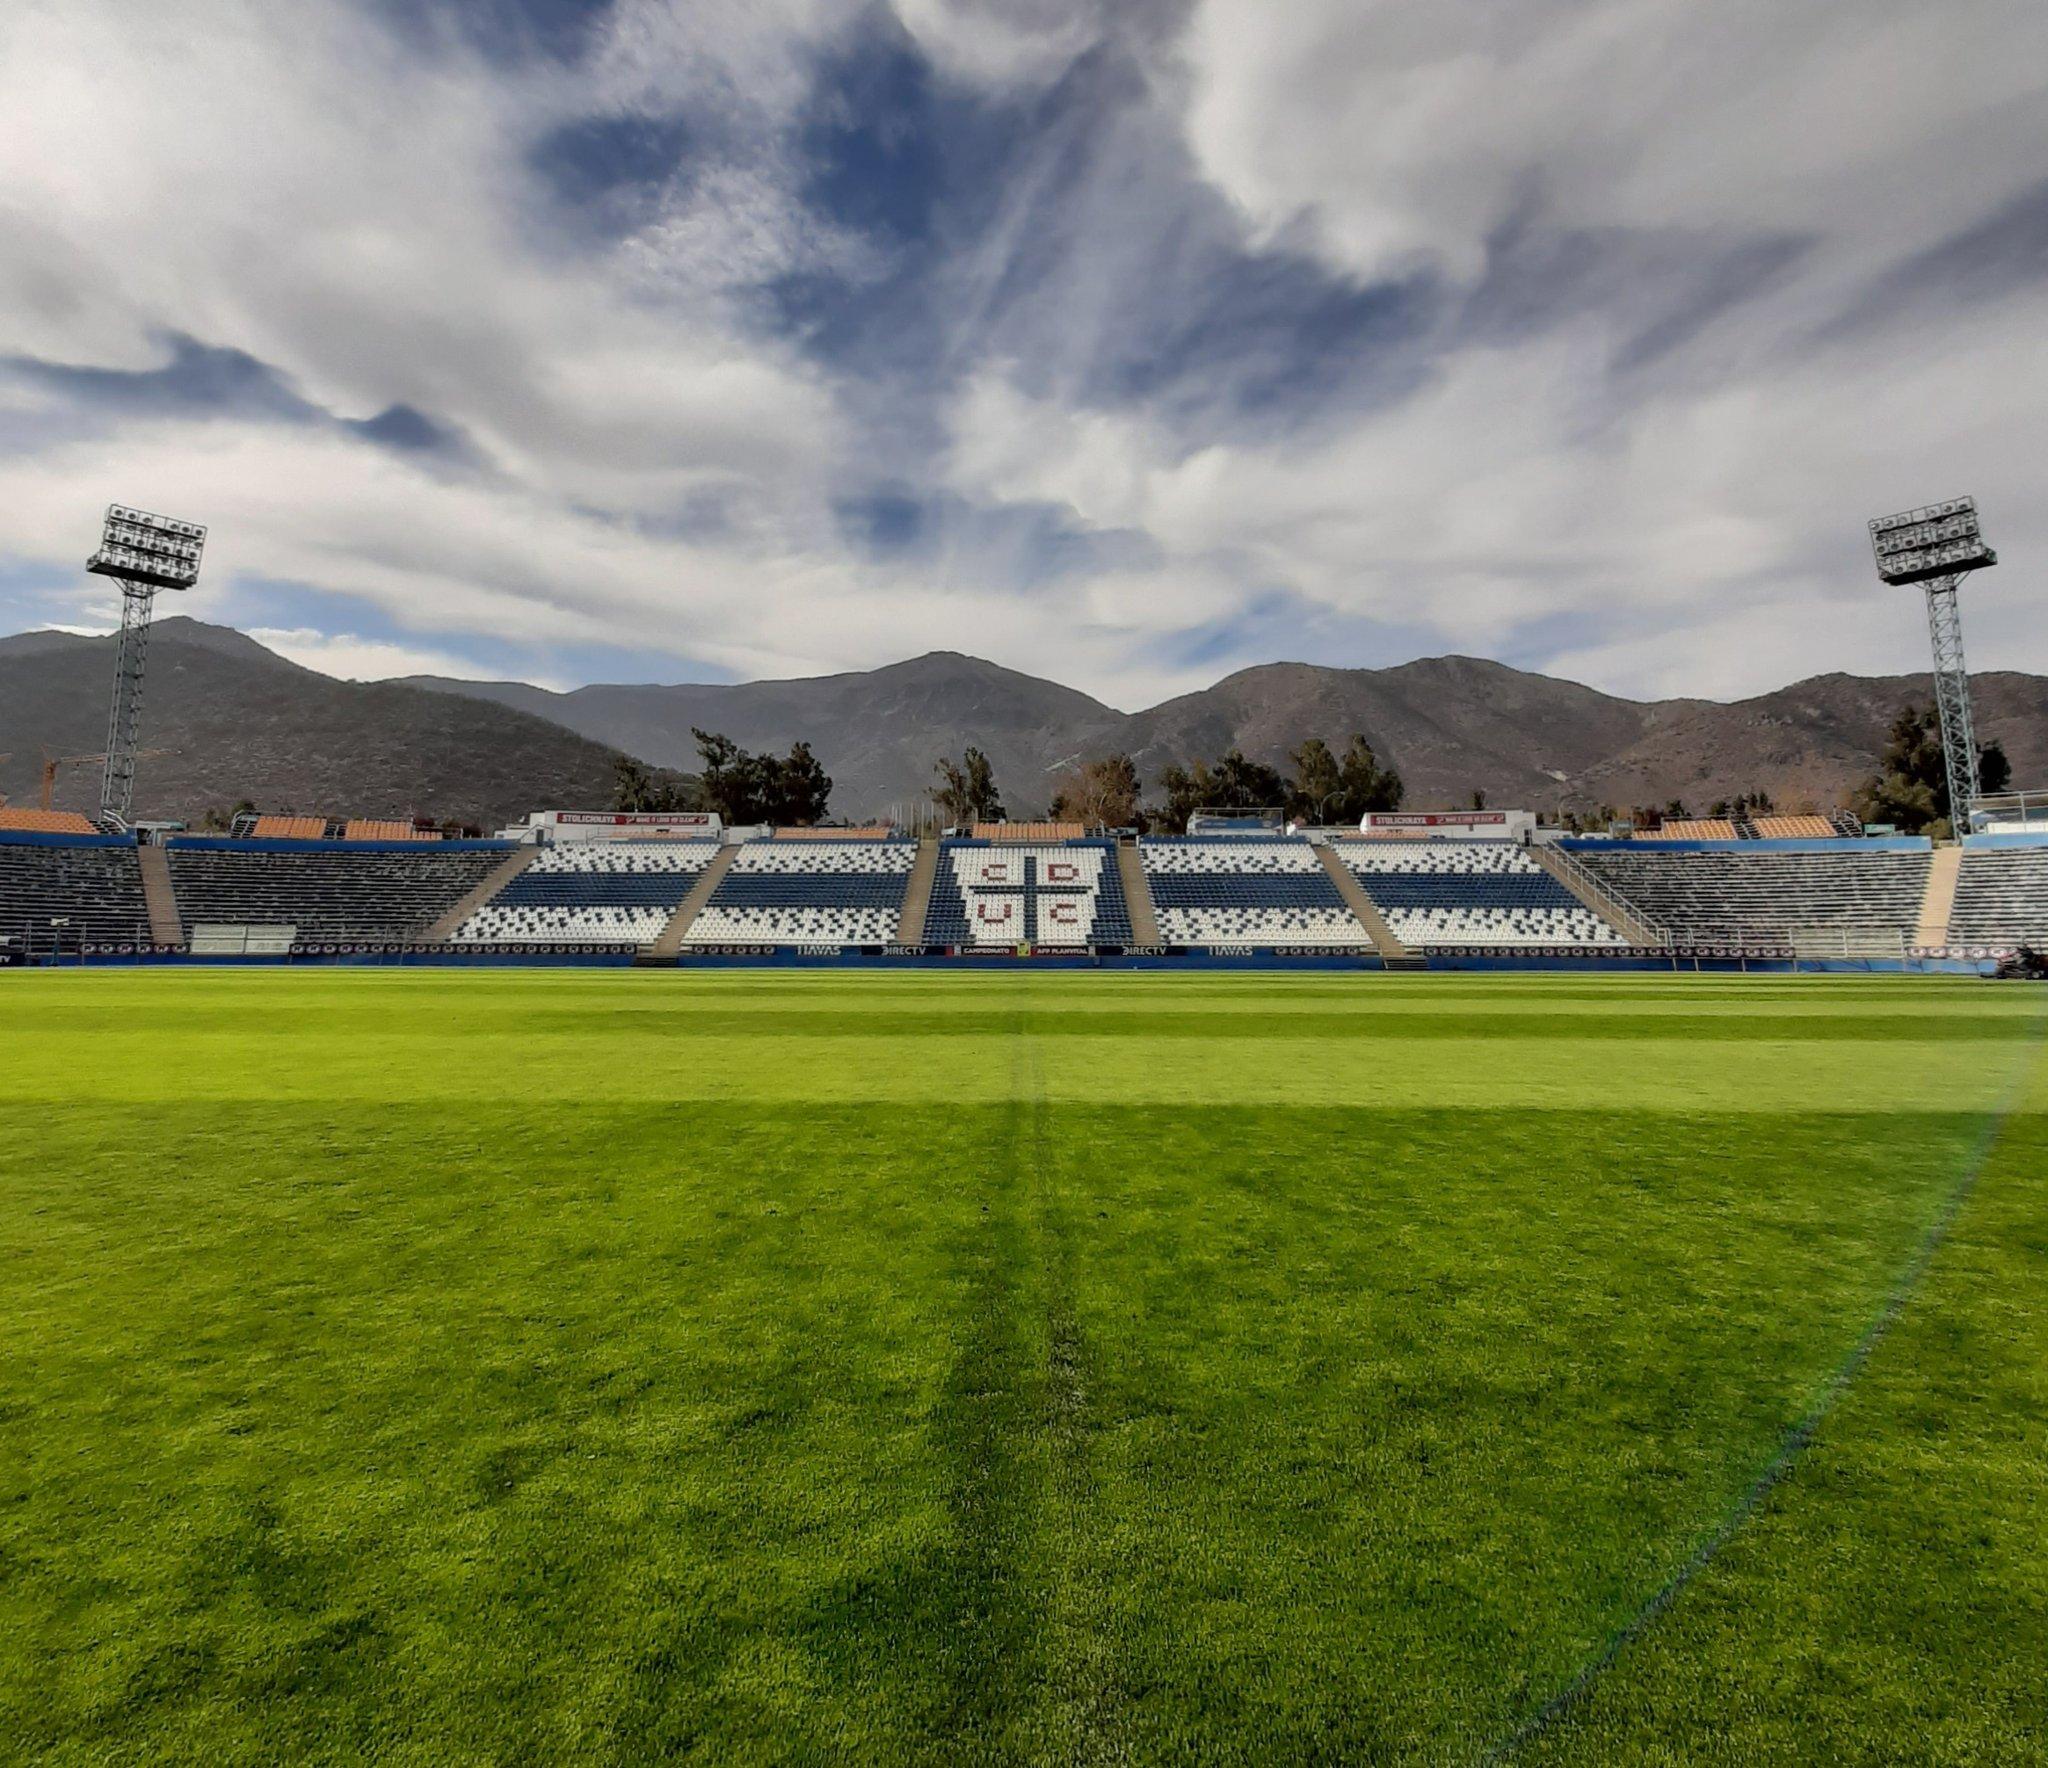 ¡Al estadio, al estadiooooo! ⚪🔵  ¡Vamos #LosCruzados! https://t.co/JgyrOkKJLc